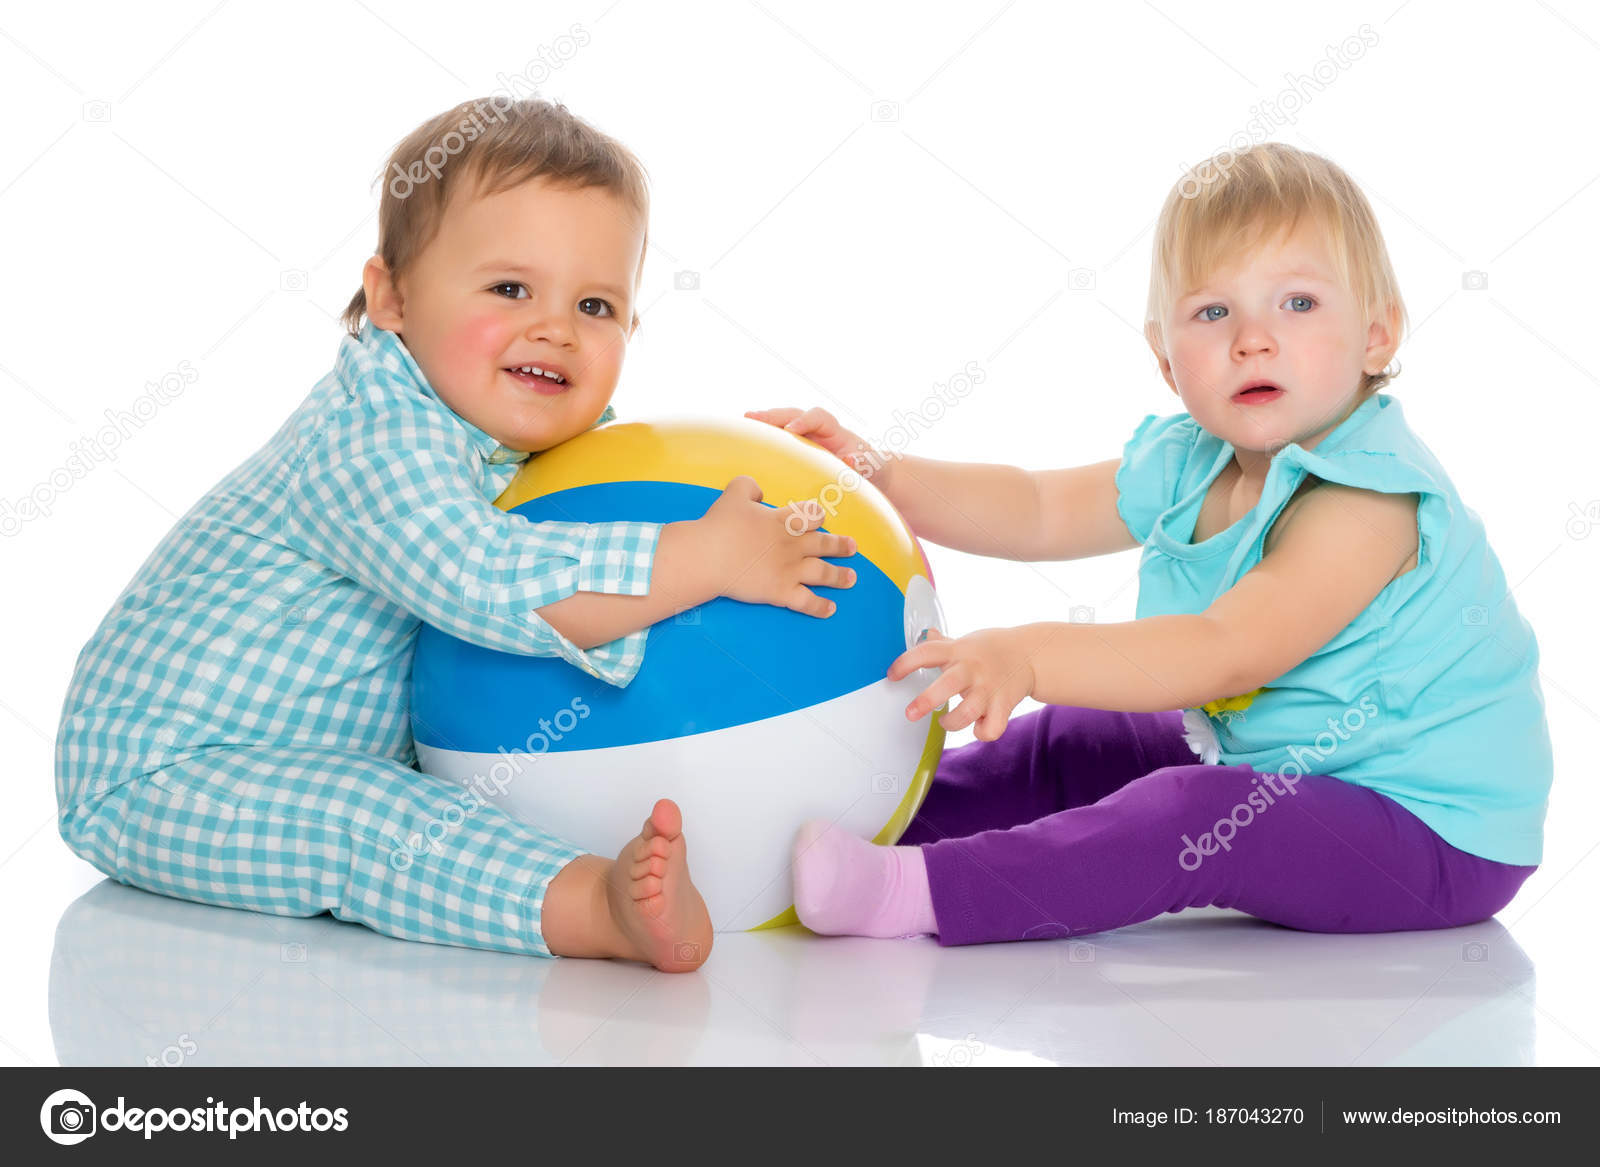 2d8b5836e6f Μικρό παιδί αγόρι και κορίτσι παίζει με μπάλα. — Φωτογραφία Αρχείου ...